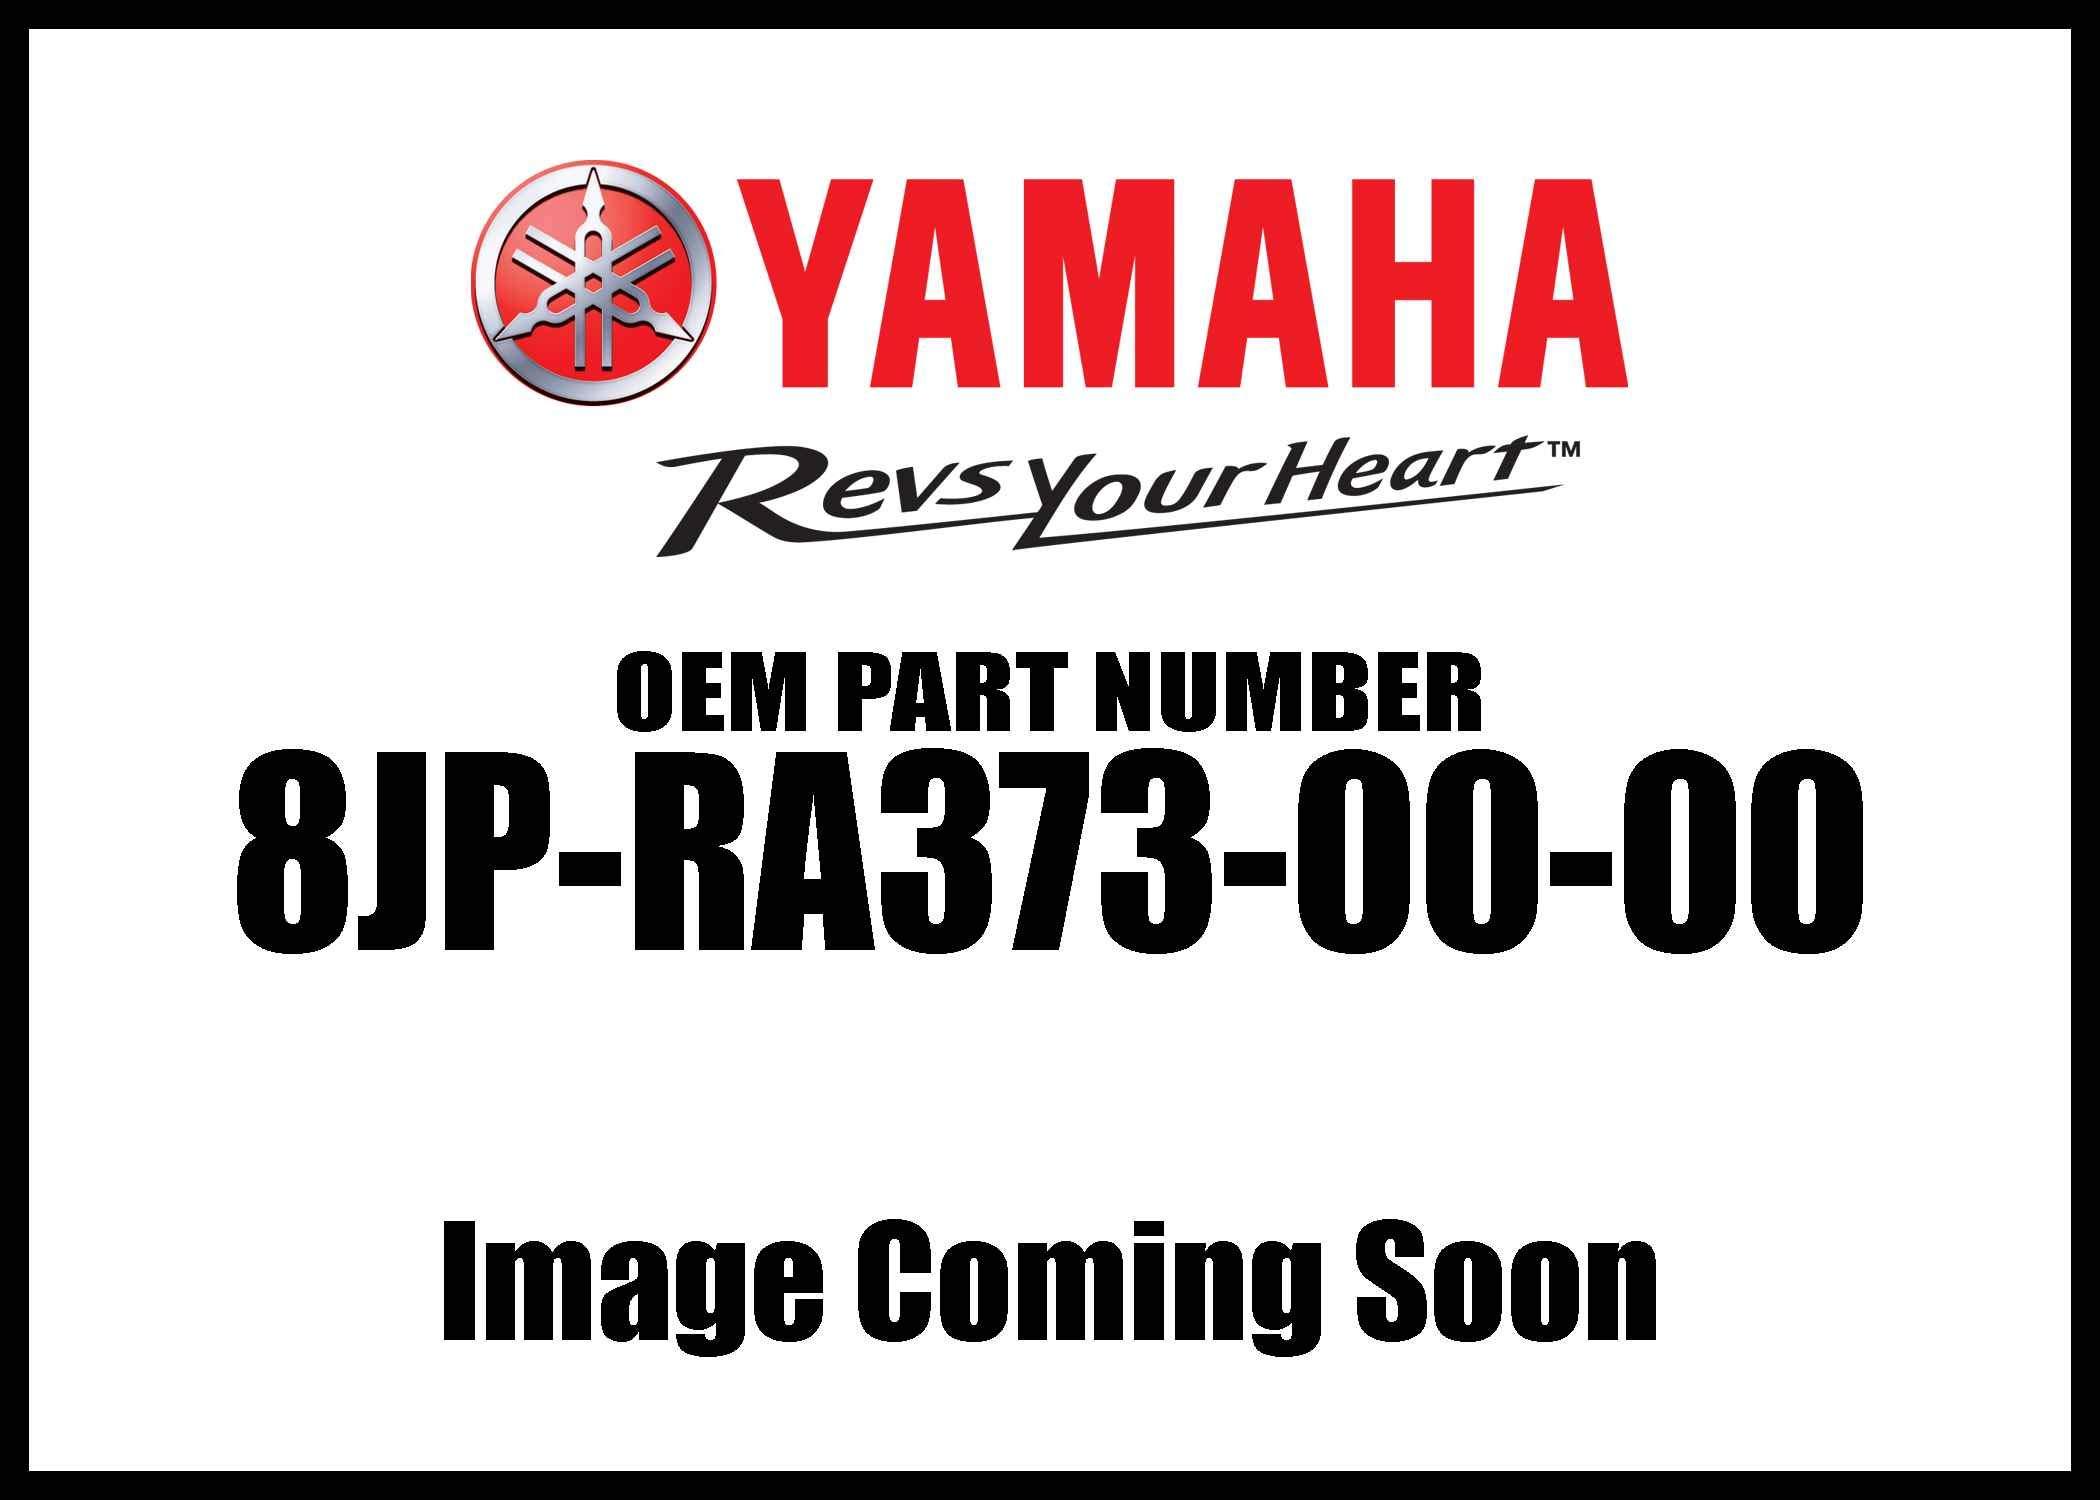 Yamaha Nut Insert 8Jp-Ra373-00-00 New Oem